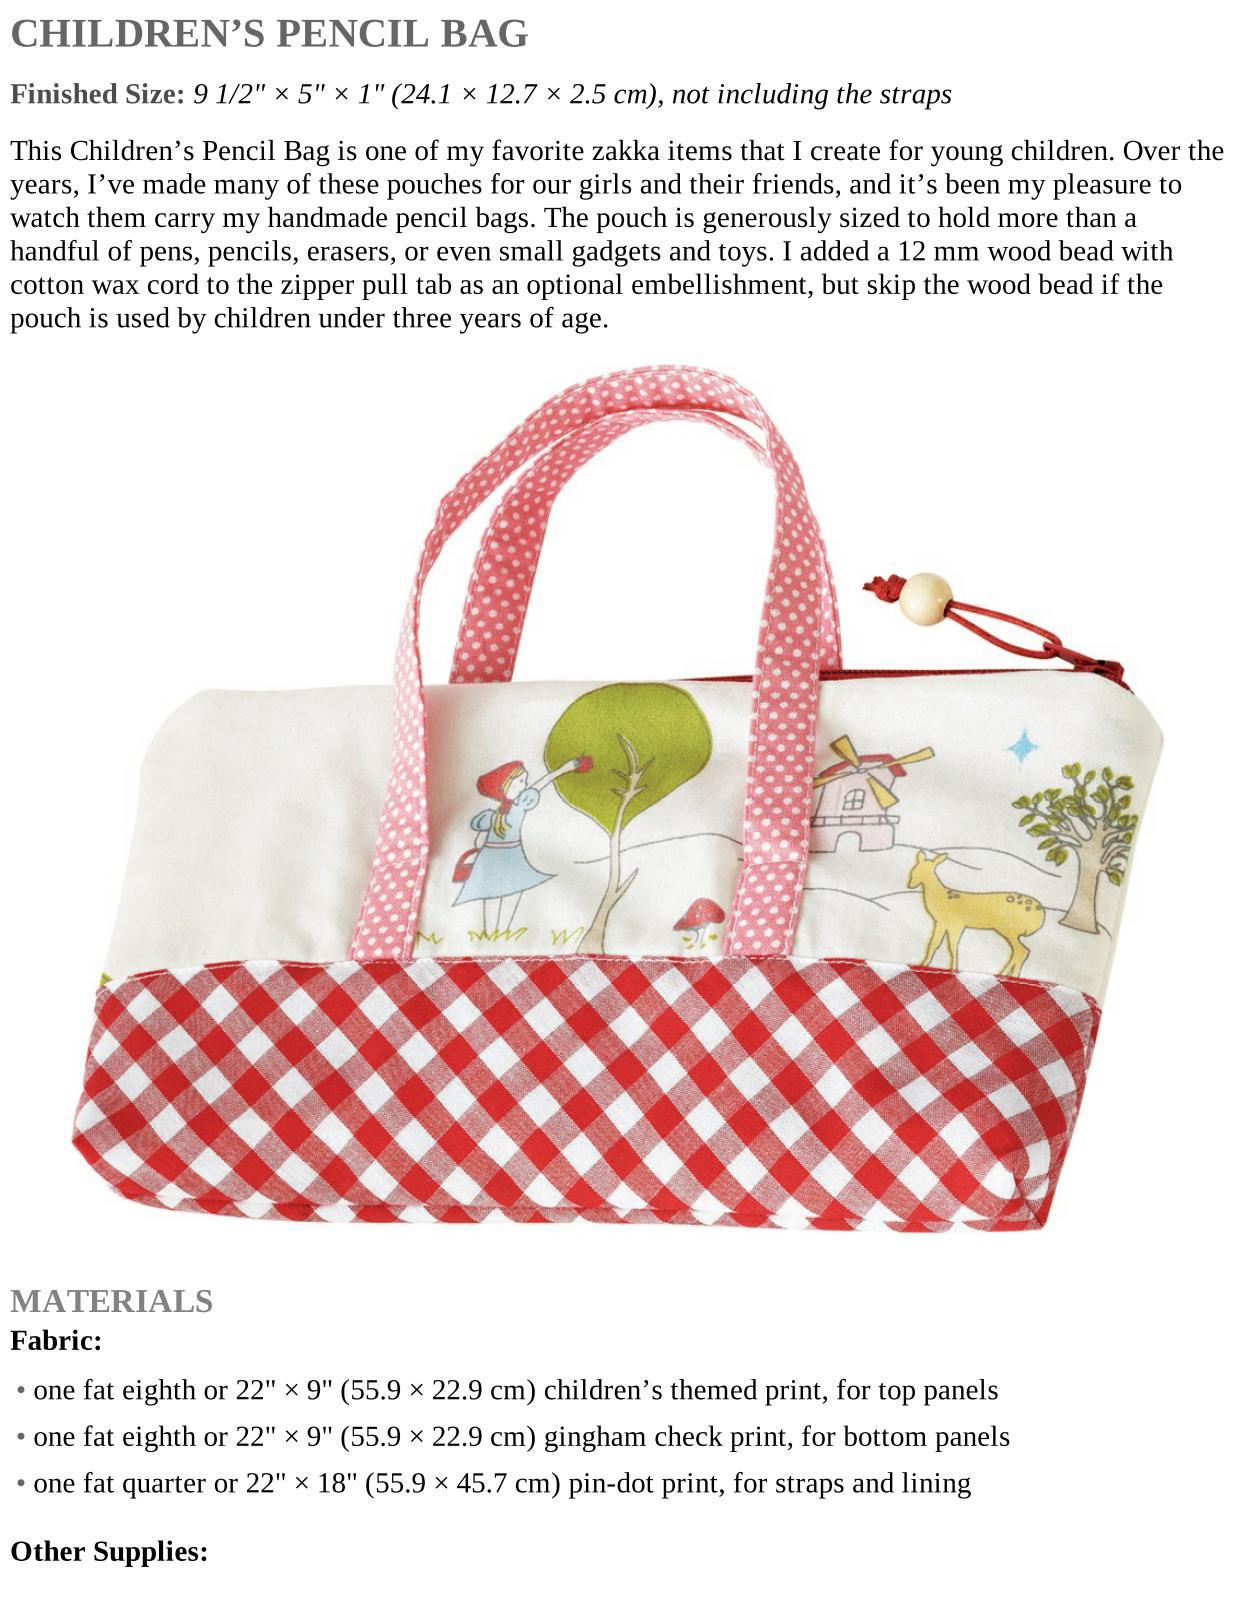 Children's Pencil Bag